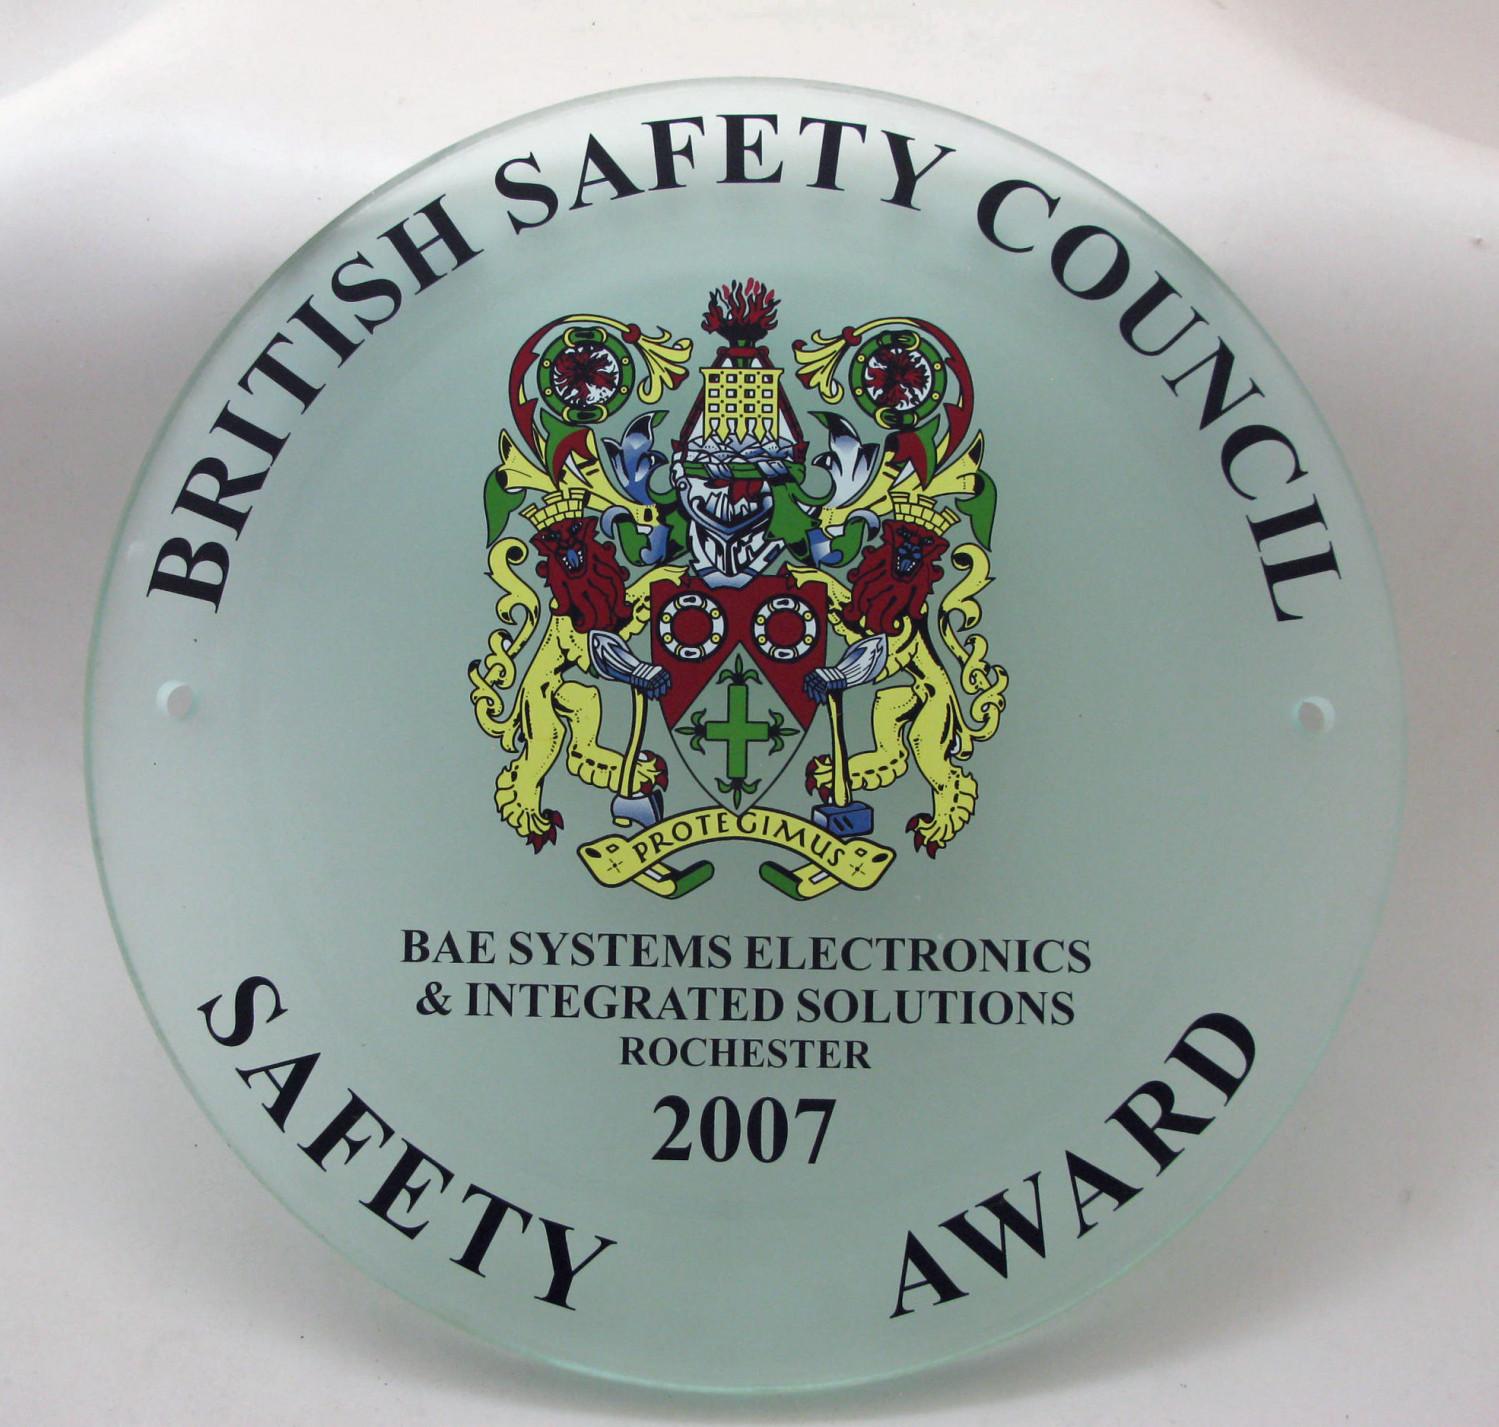 2007 Safety Award Plaque